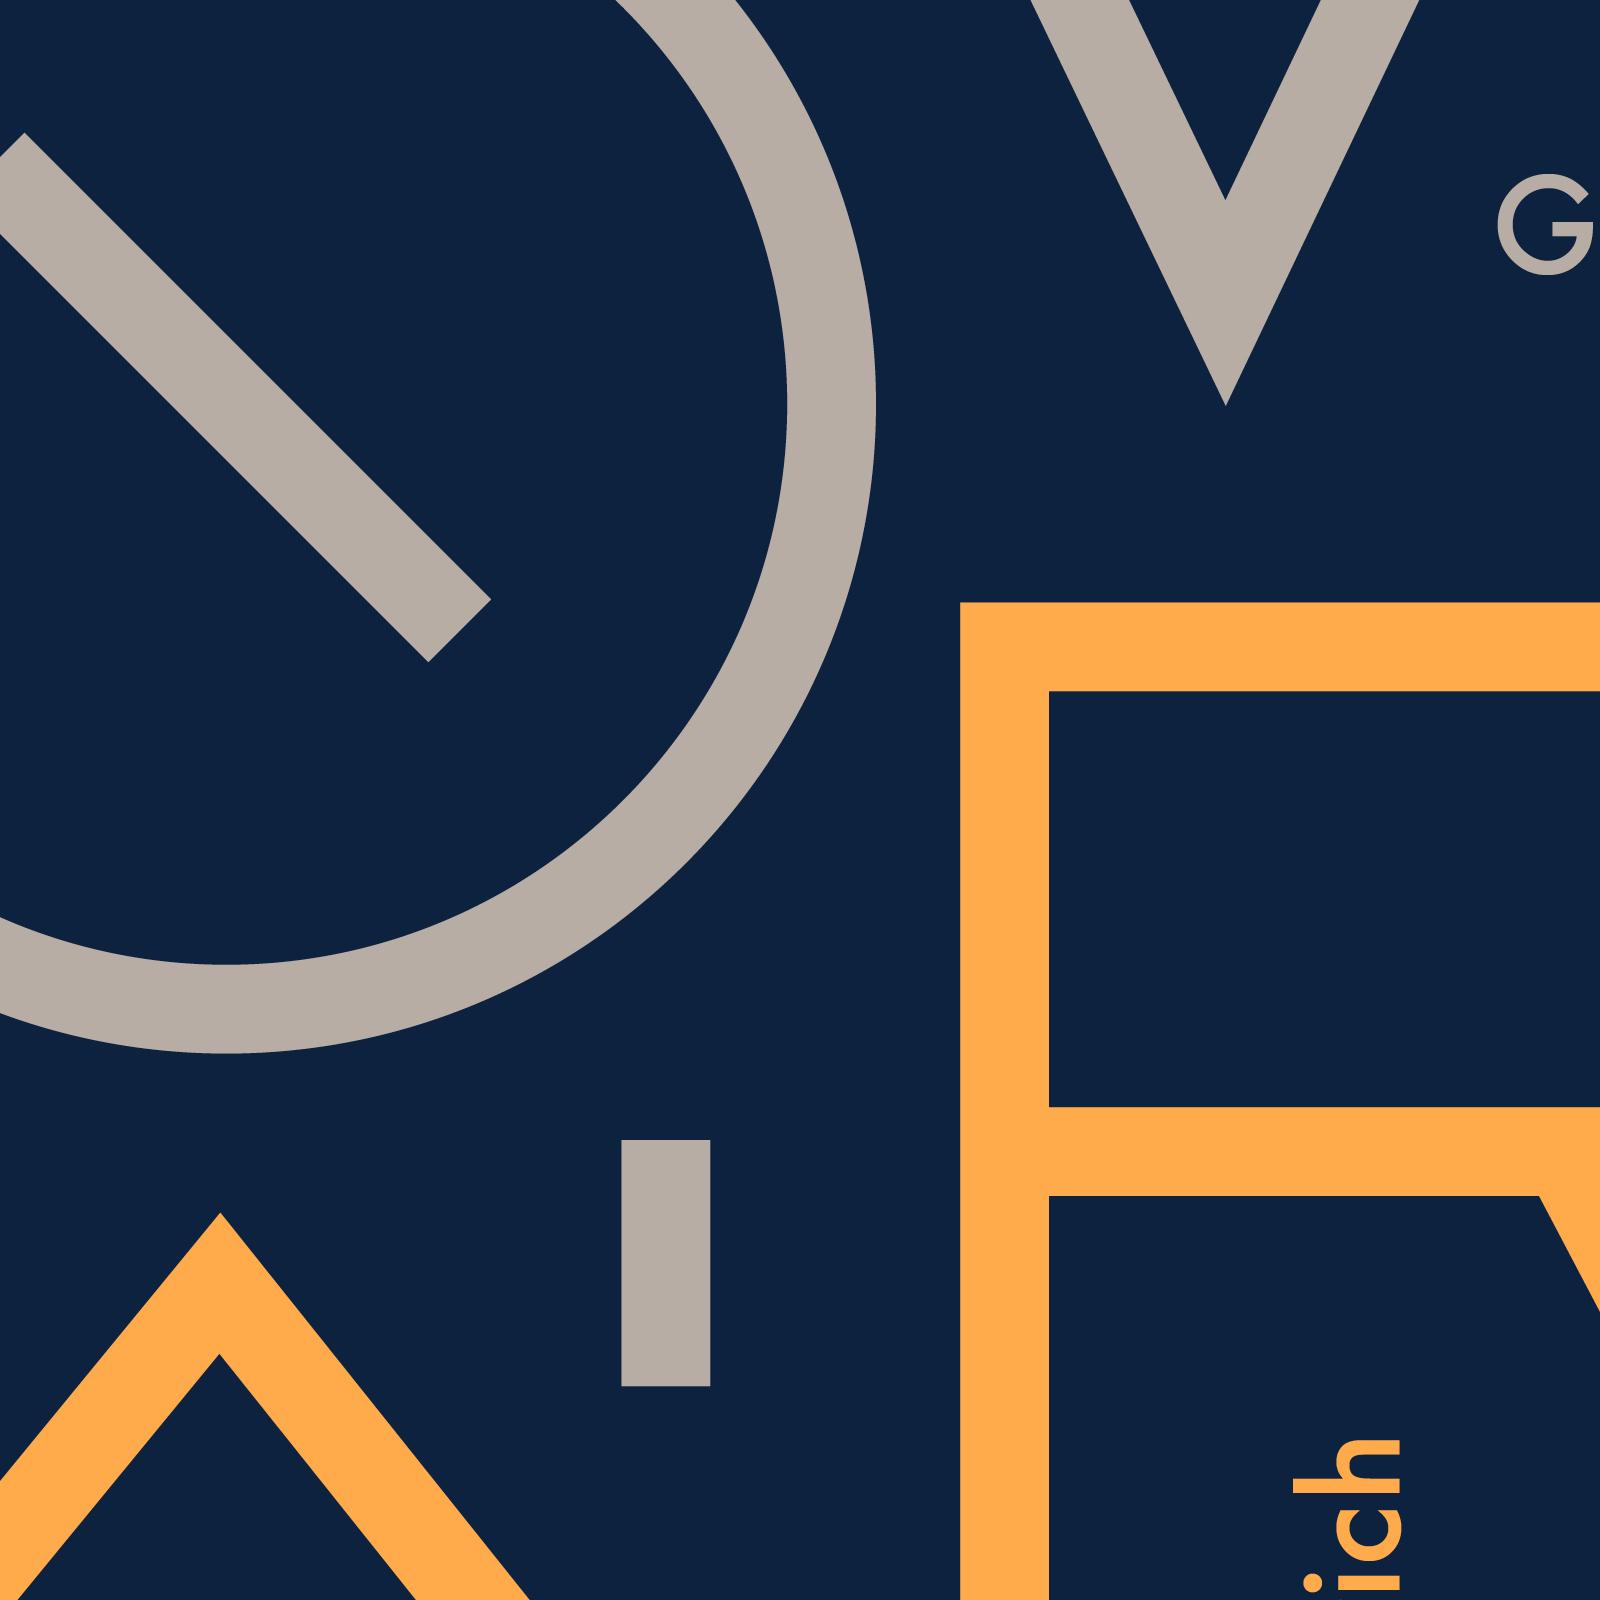 Bureau_Display_Graphic_Design_Grafik_Visual_Communication_Lucerne_Zurich_Kiss_Move_Party_Thumb